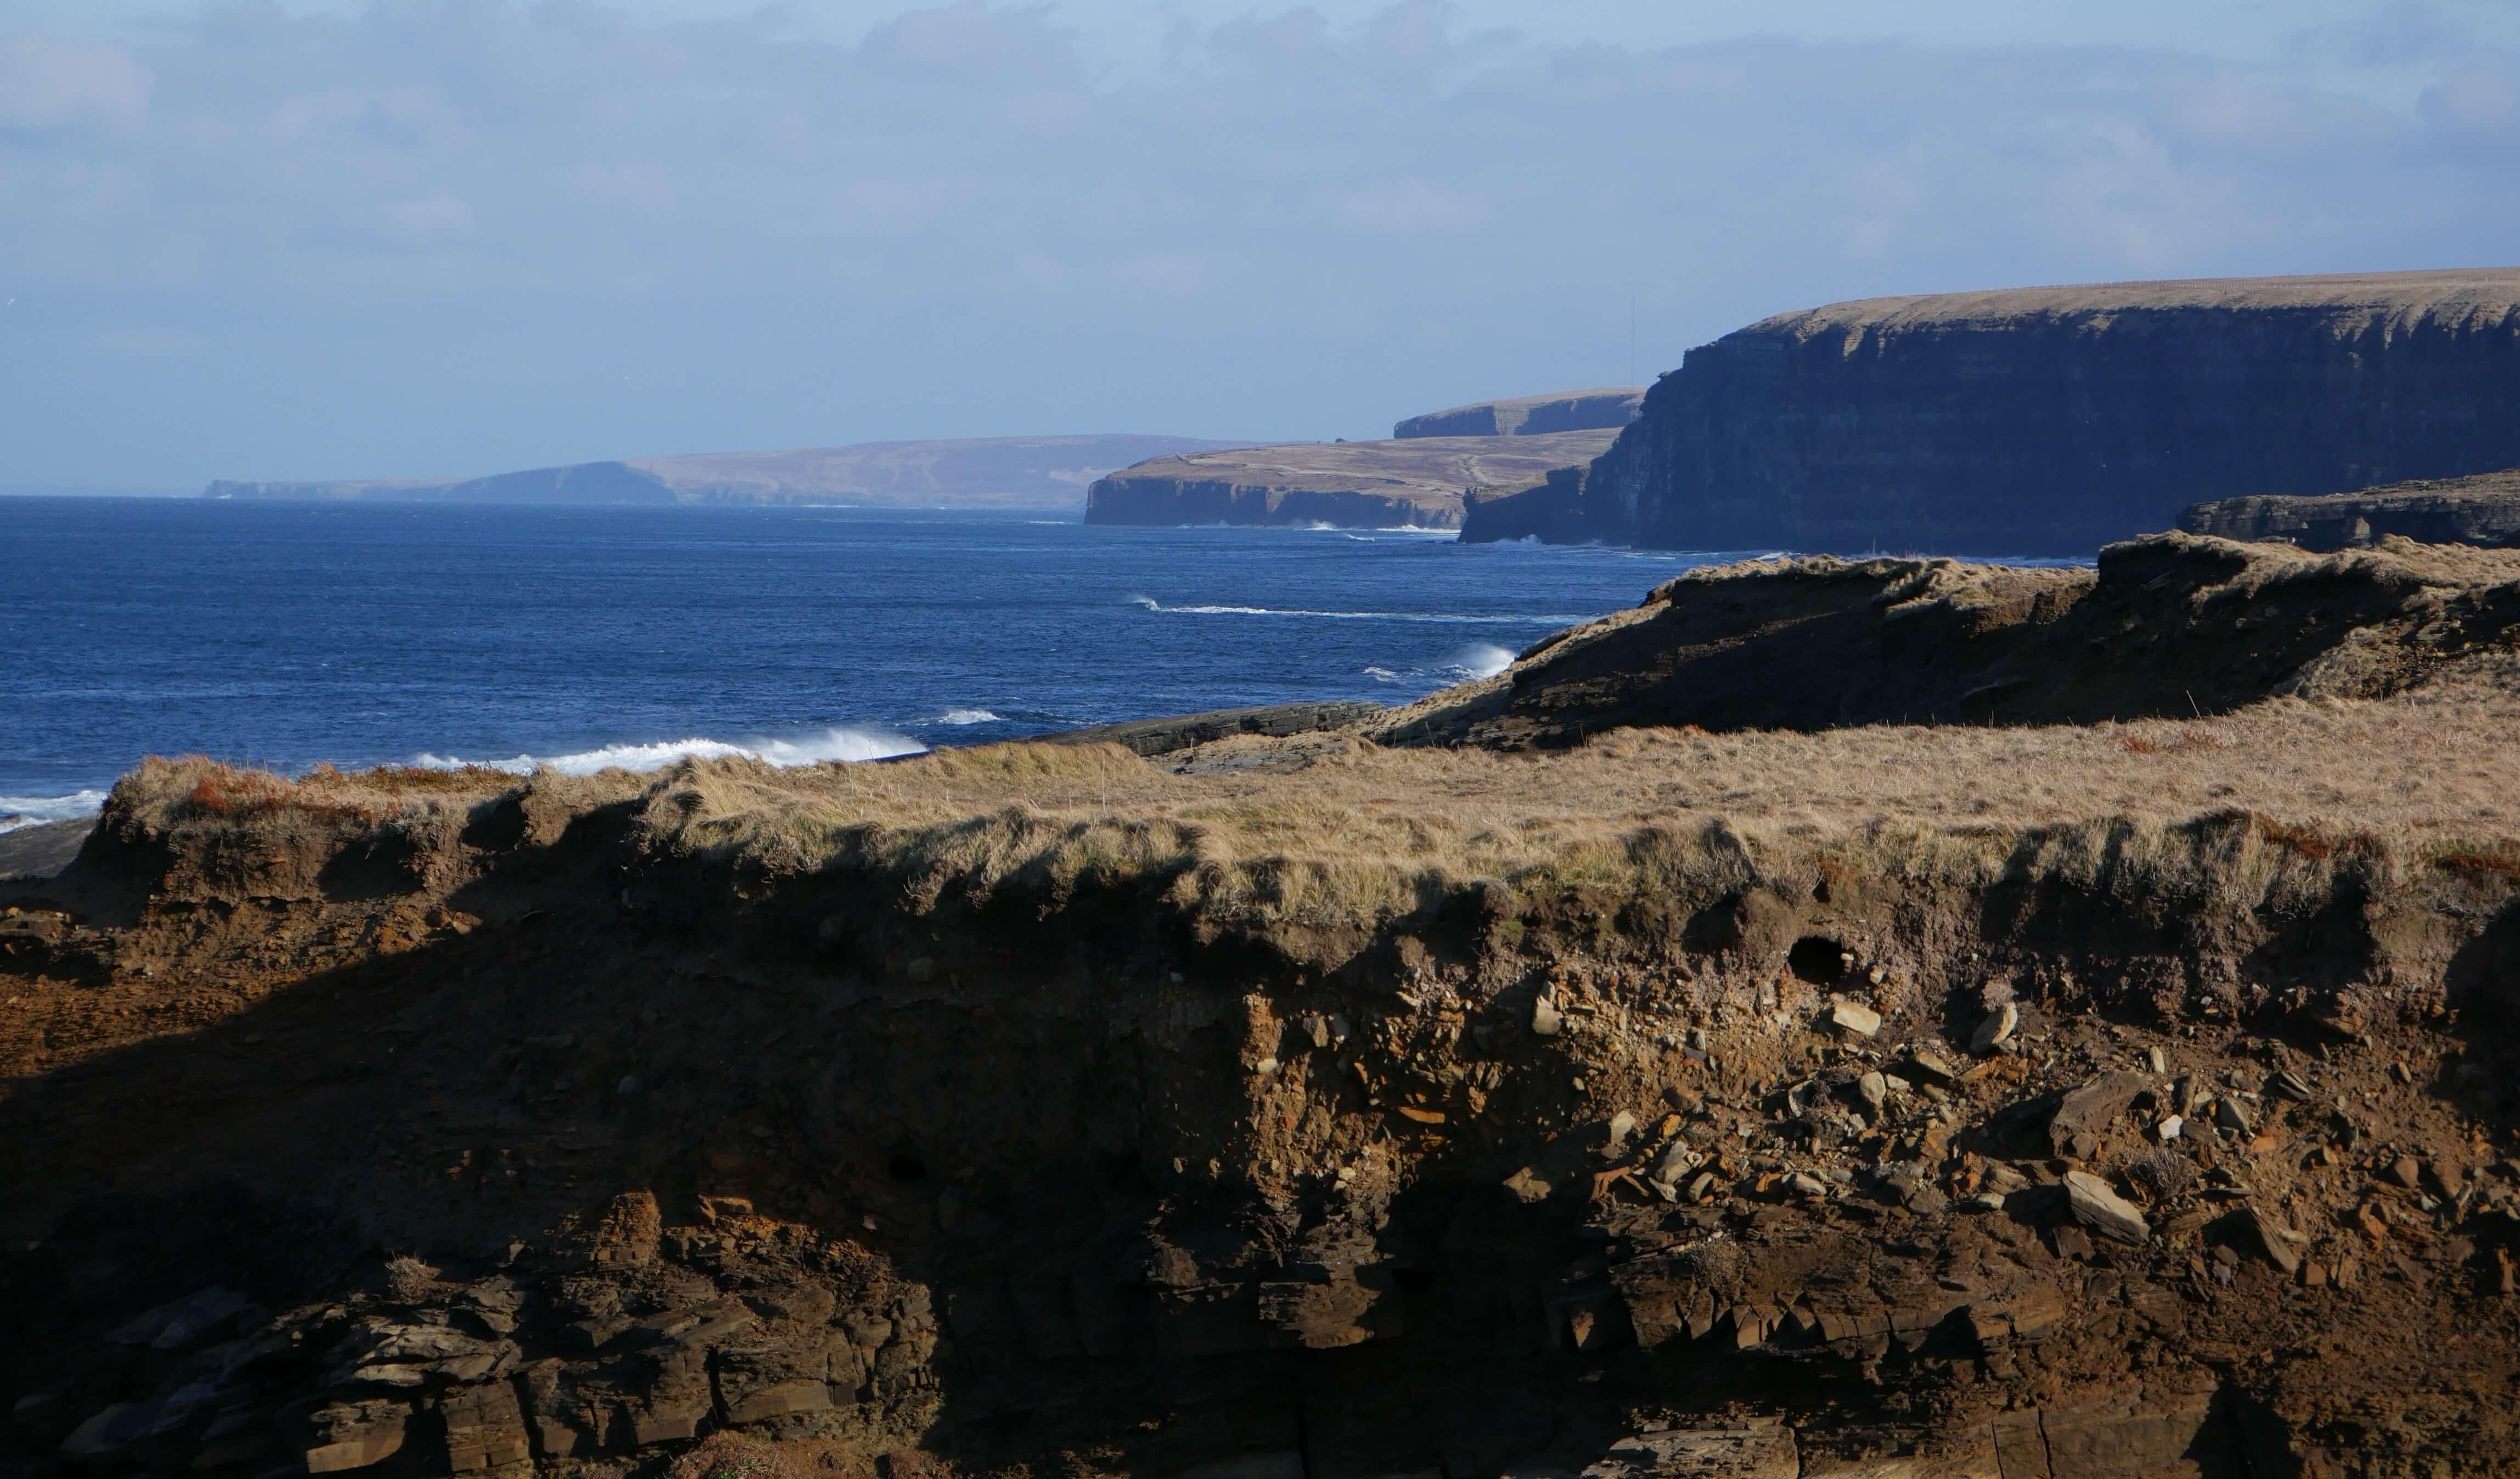 Coastline near Brough of Birsay, Orkney Islands, Scotland, UK